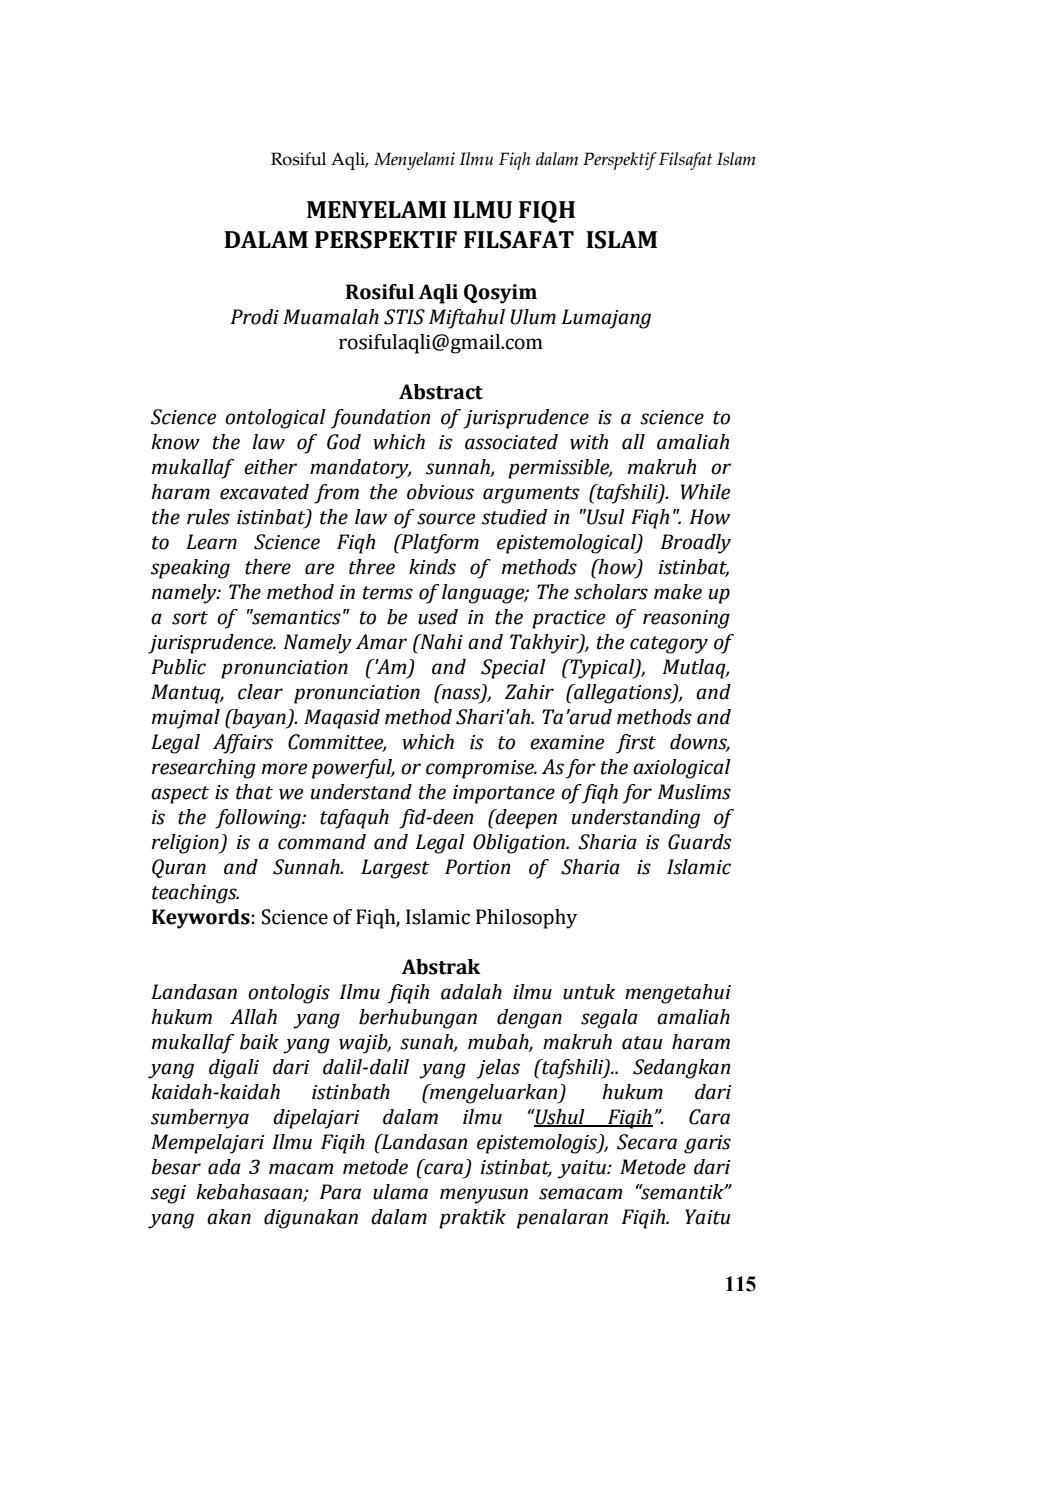 Menyelami Ilmu Fiqh Dalam Perspektif Filsafat Islam By Qolamuna Jurnal Studi Islam Issuu